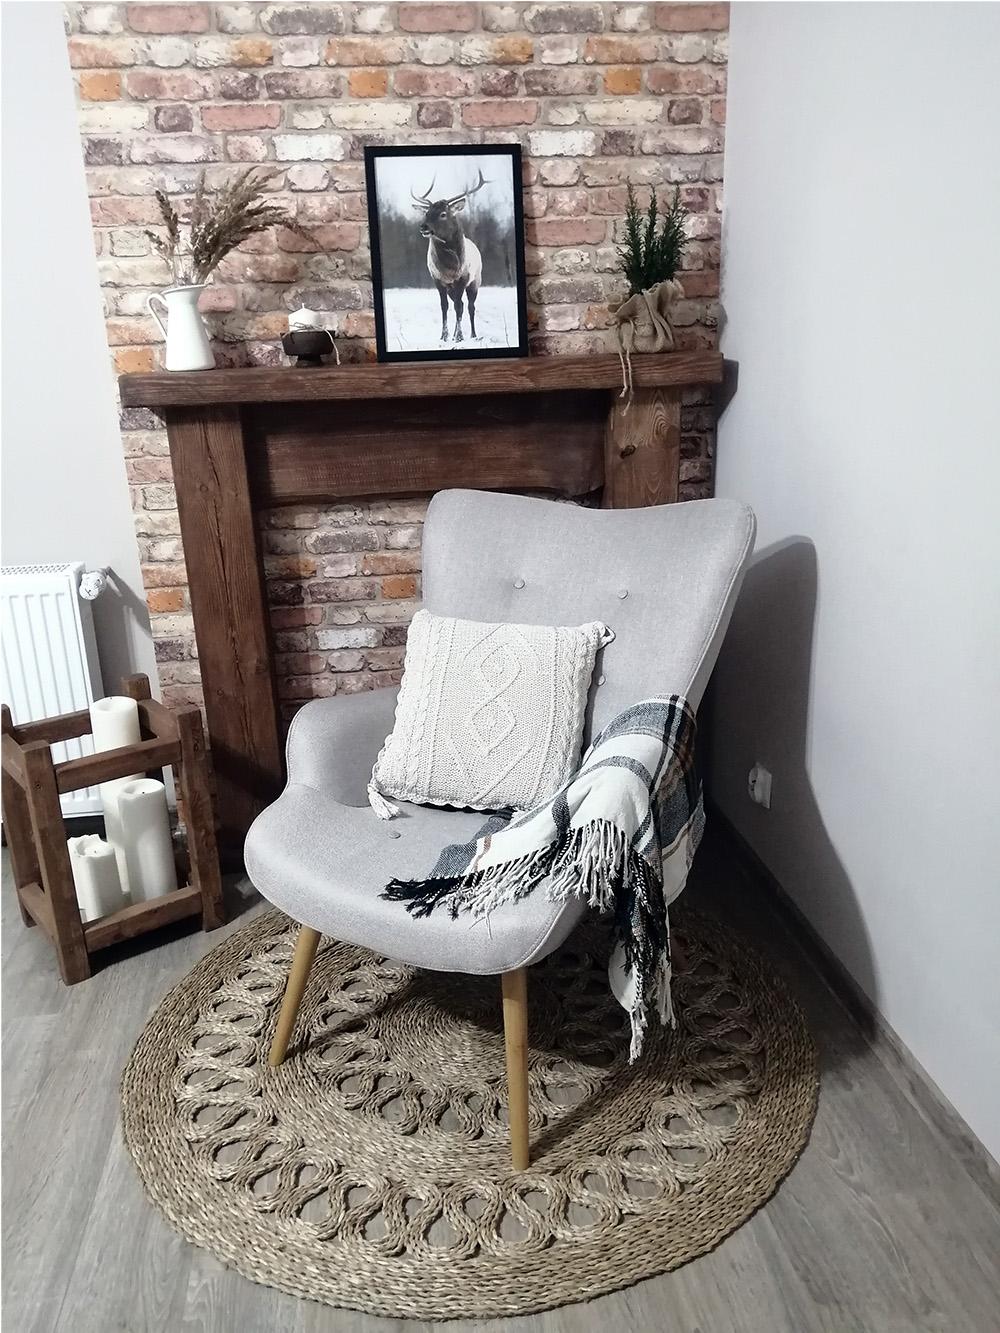 Ducon armchair from Dominika